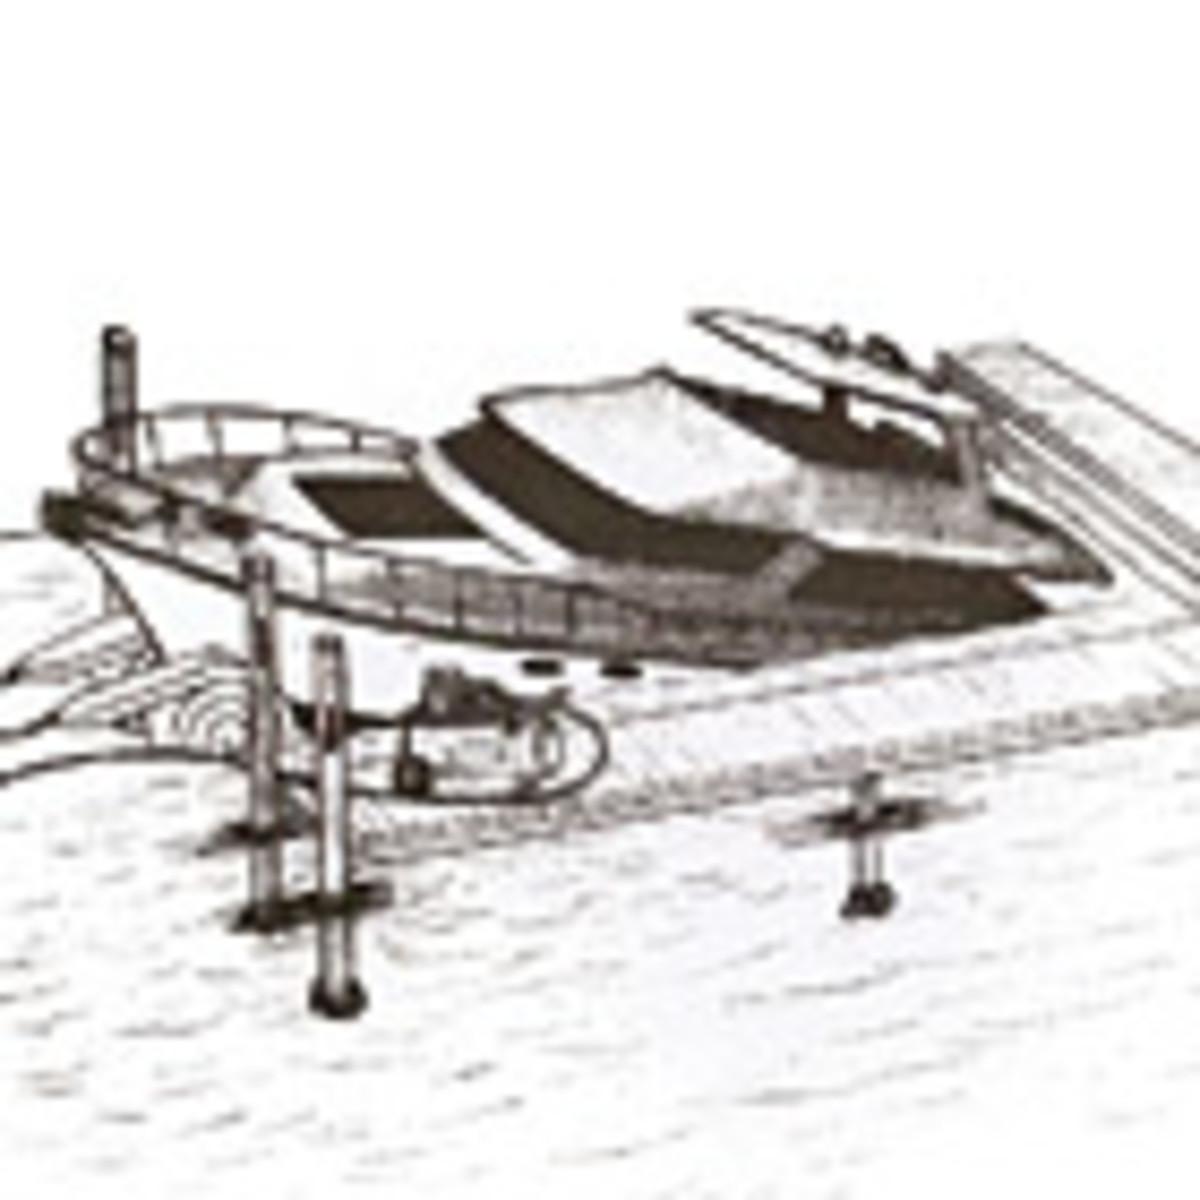 vessel_retriever_sketch1